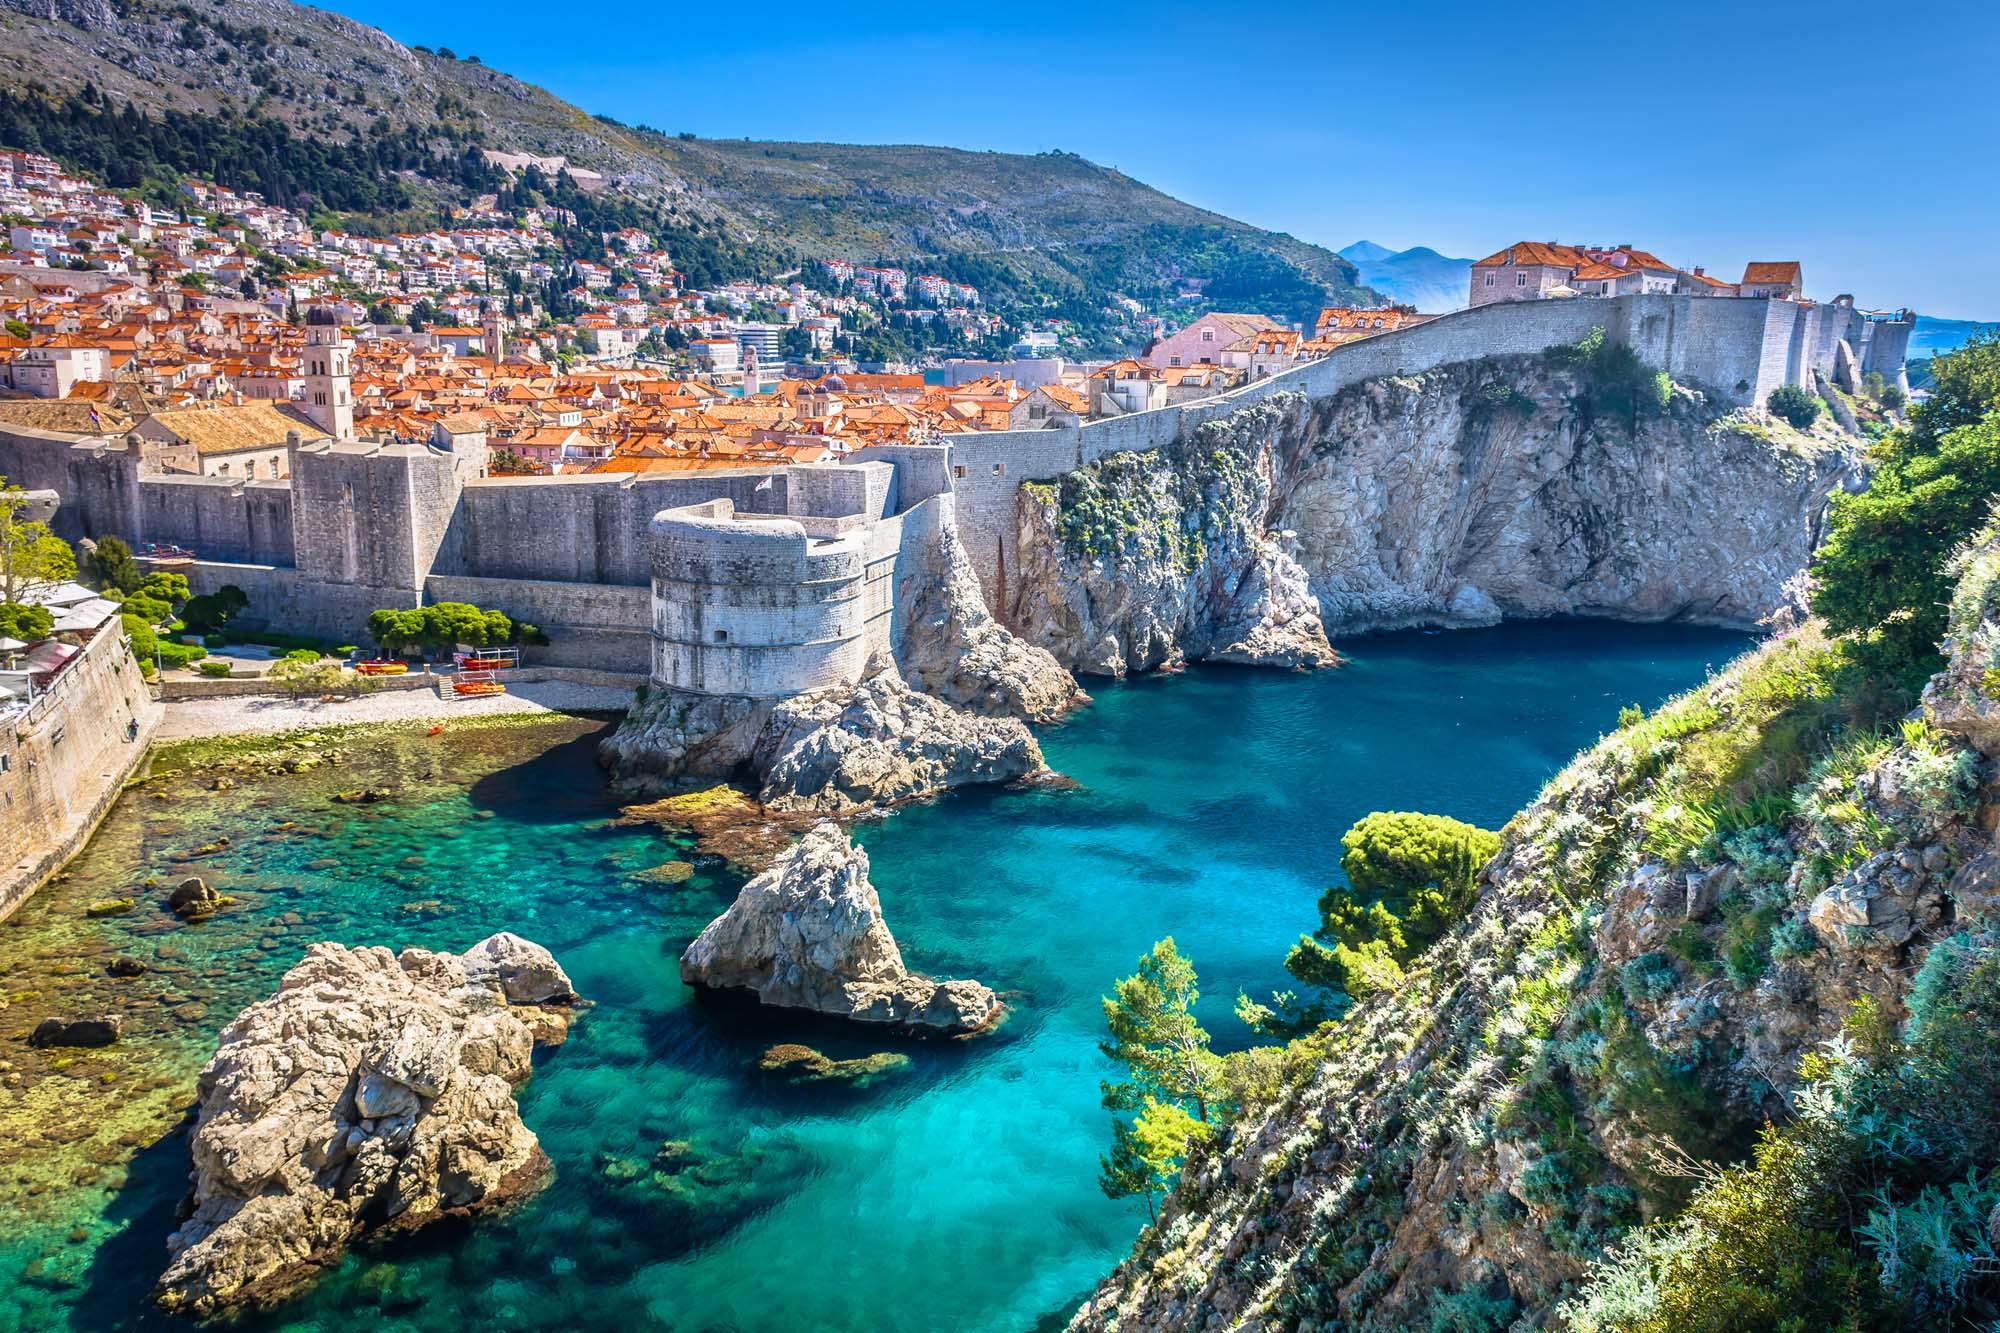 Dubrovnik, Croatia eid summer travel destination ideas